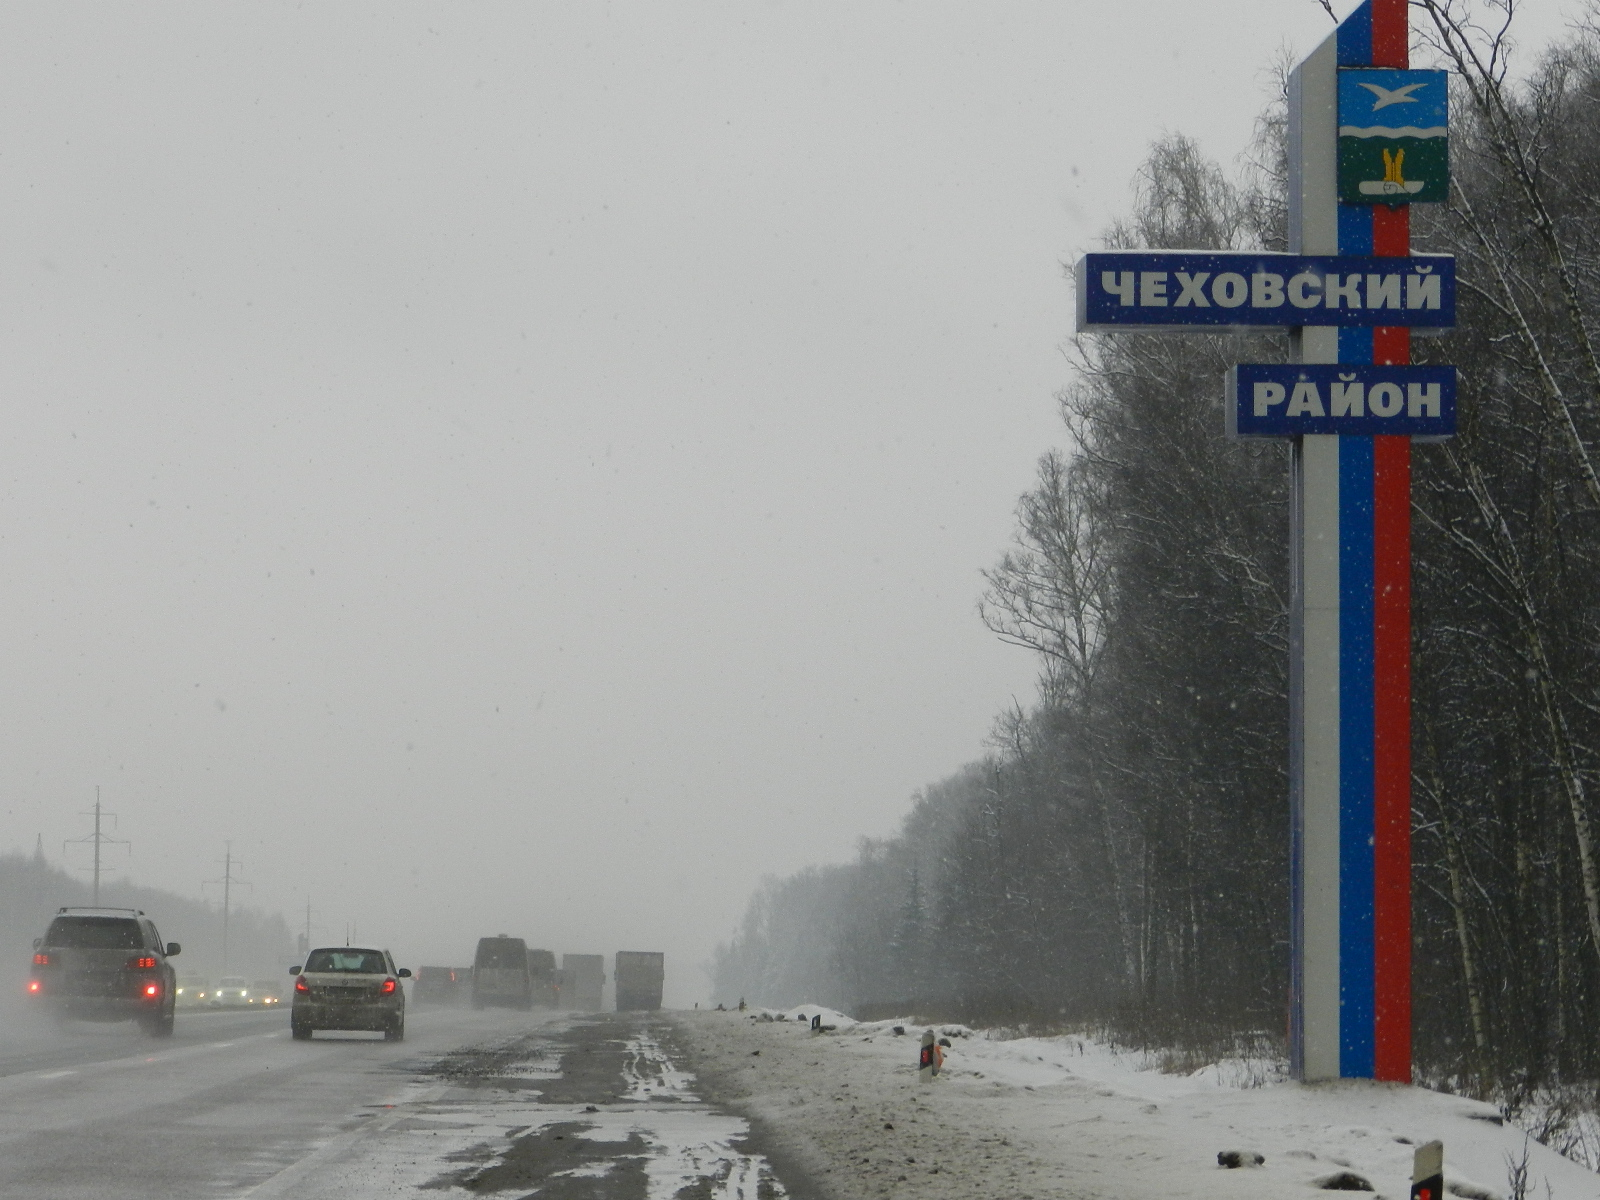 chehovskiy rayon